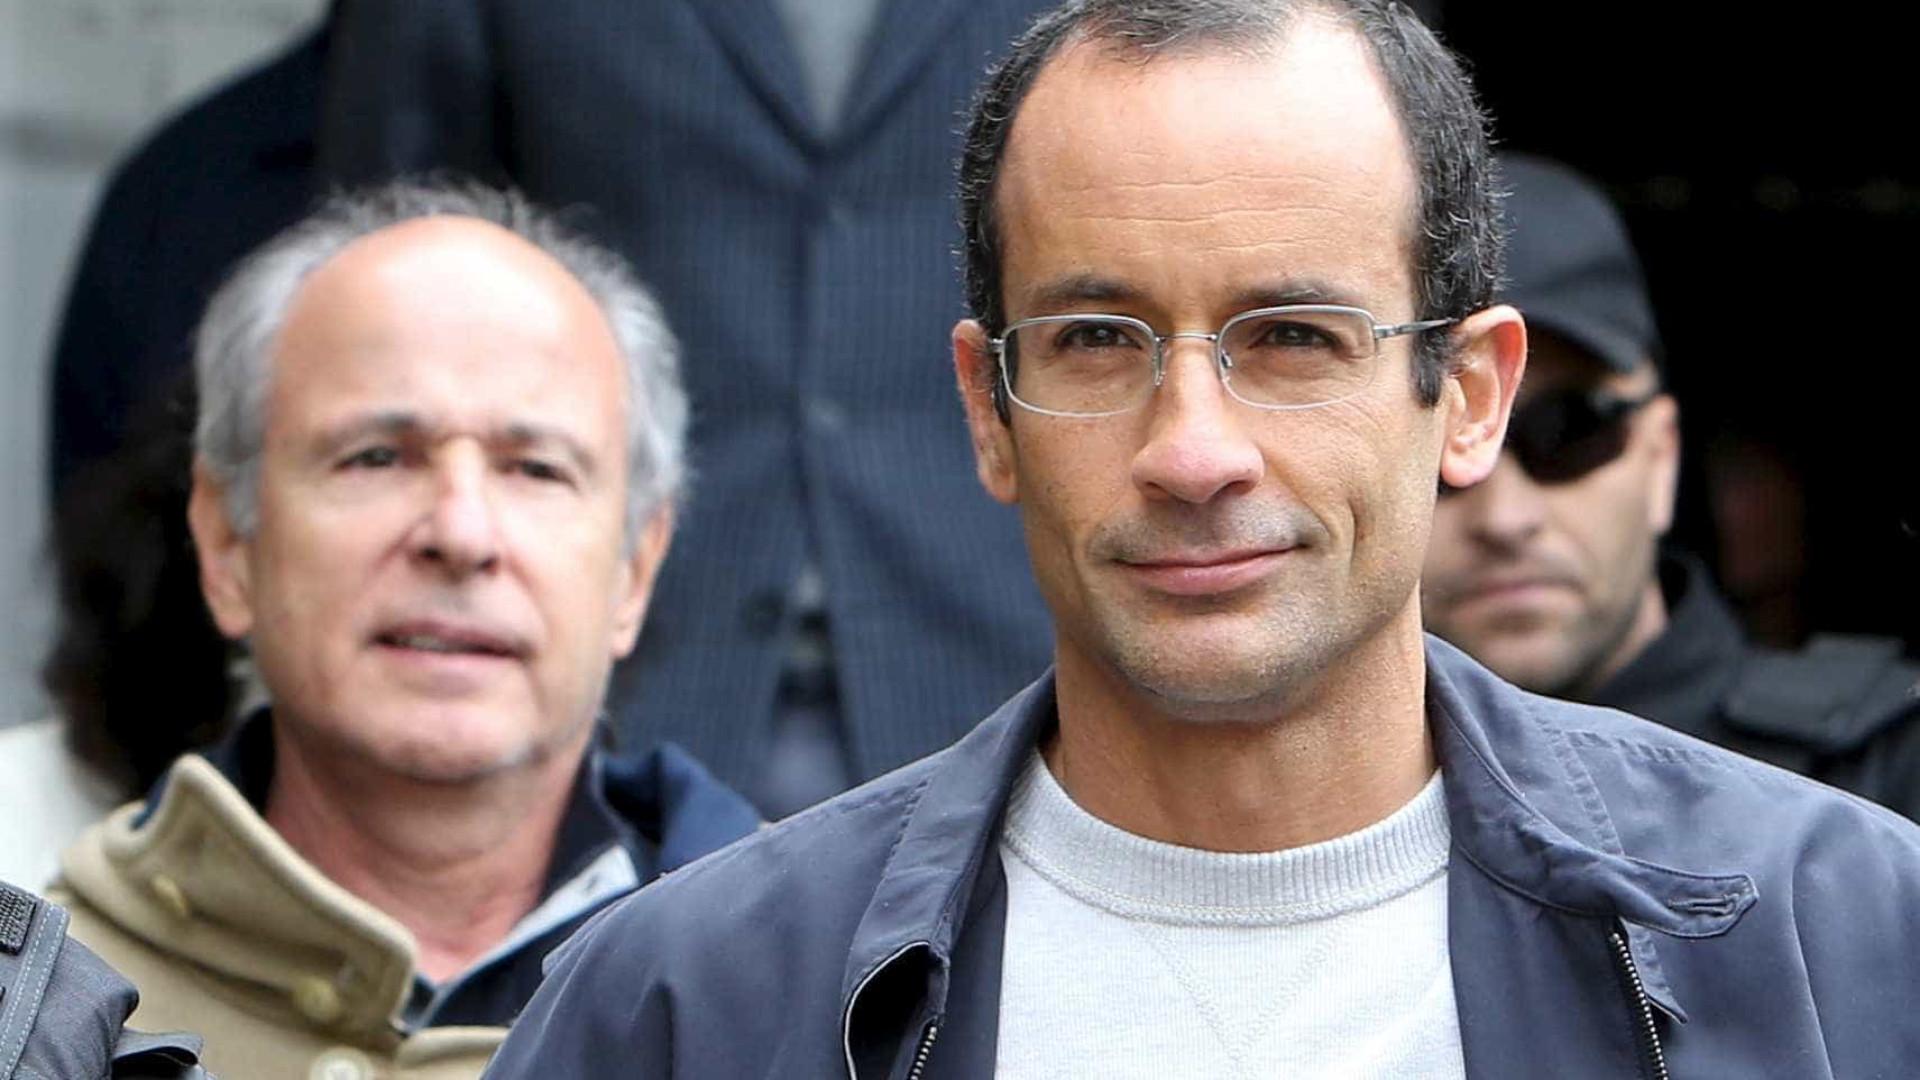 Em prisão domicilar, Marcelo Odebrecht solicita visita de 8 delatores